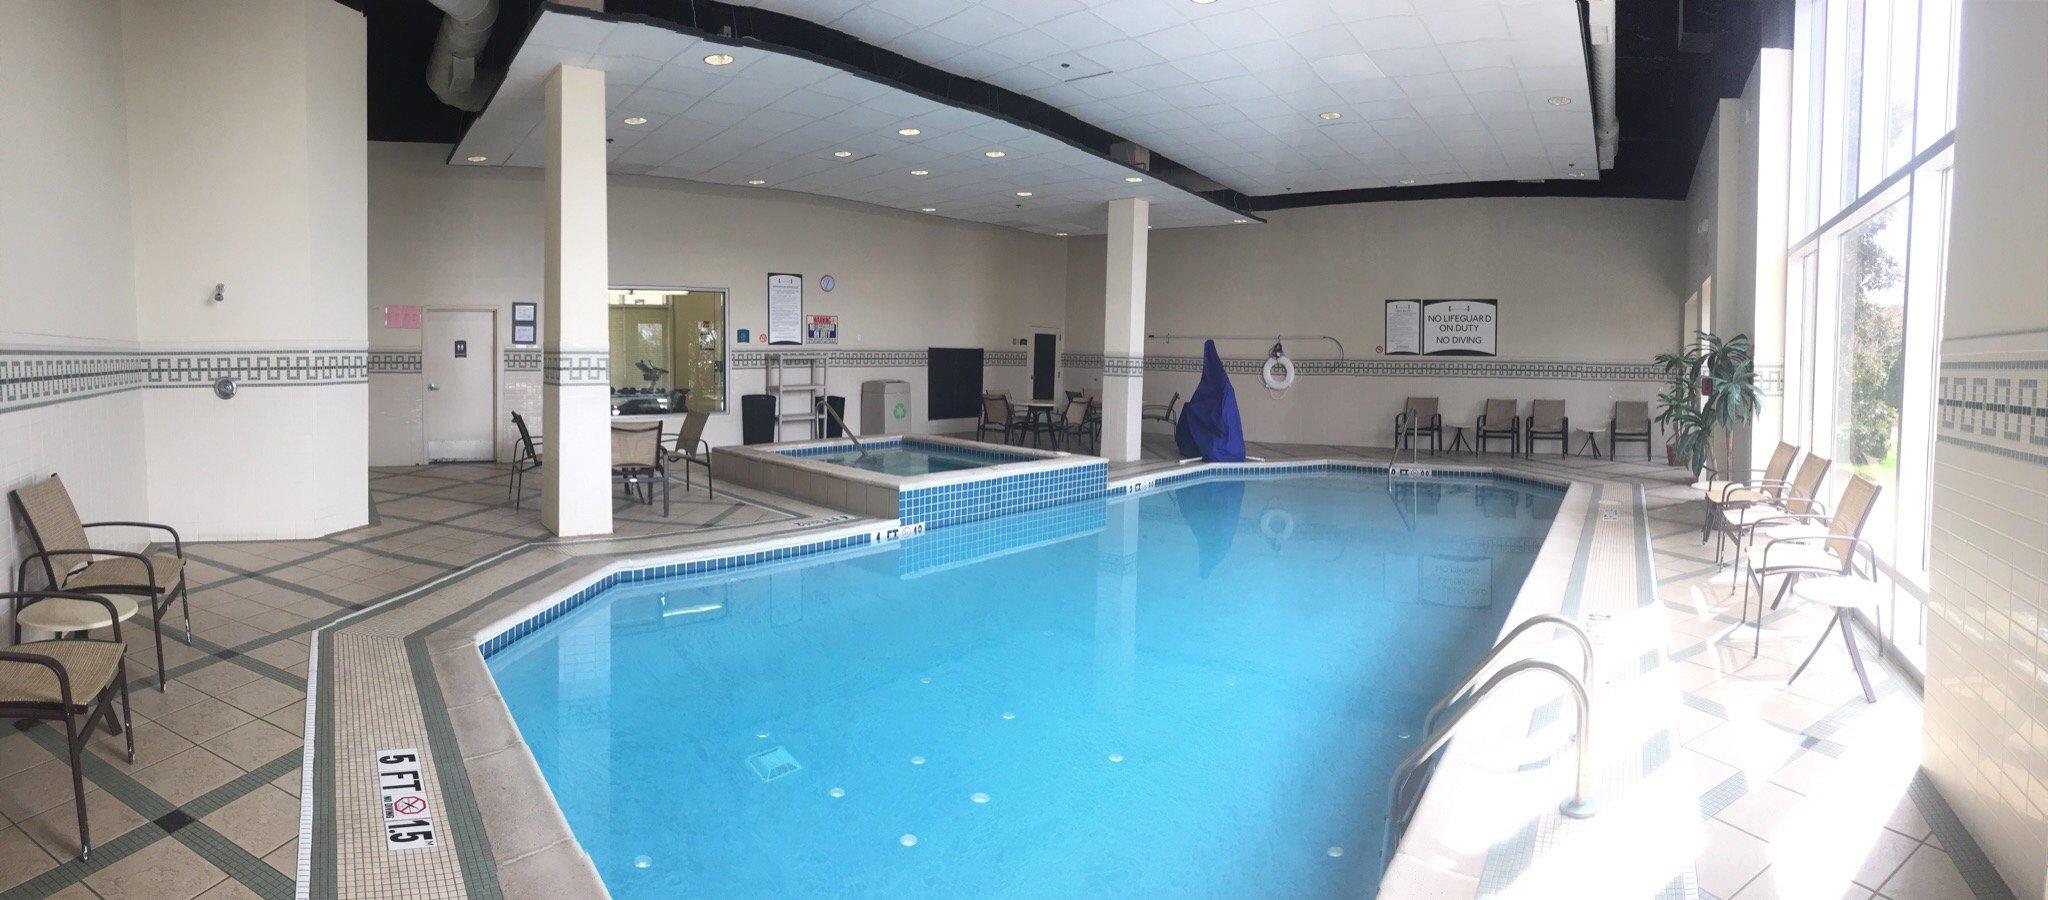 Staybridge Suites Chattanooga Downtown Tn 2018 Hotel